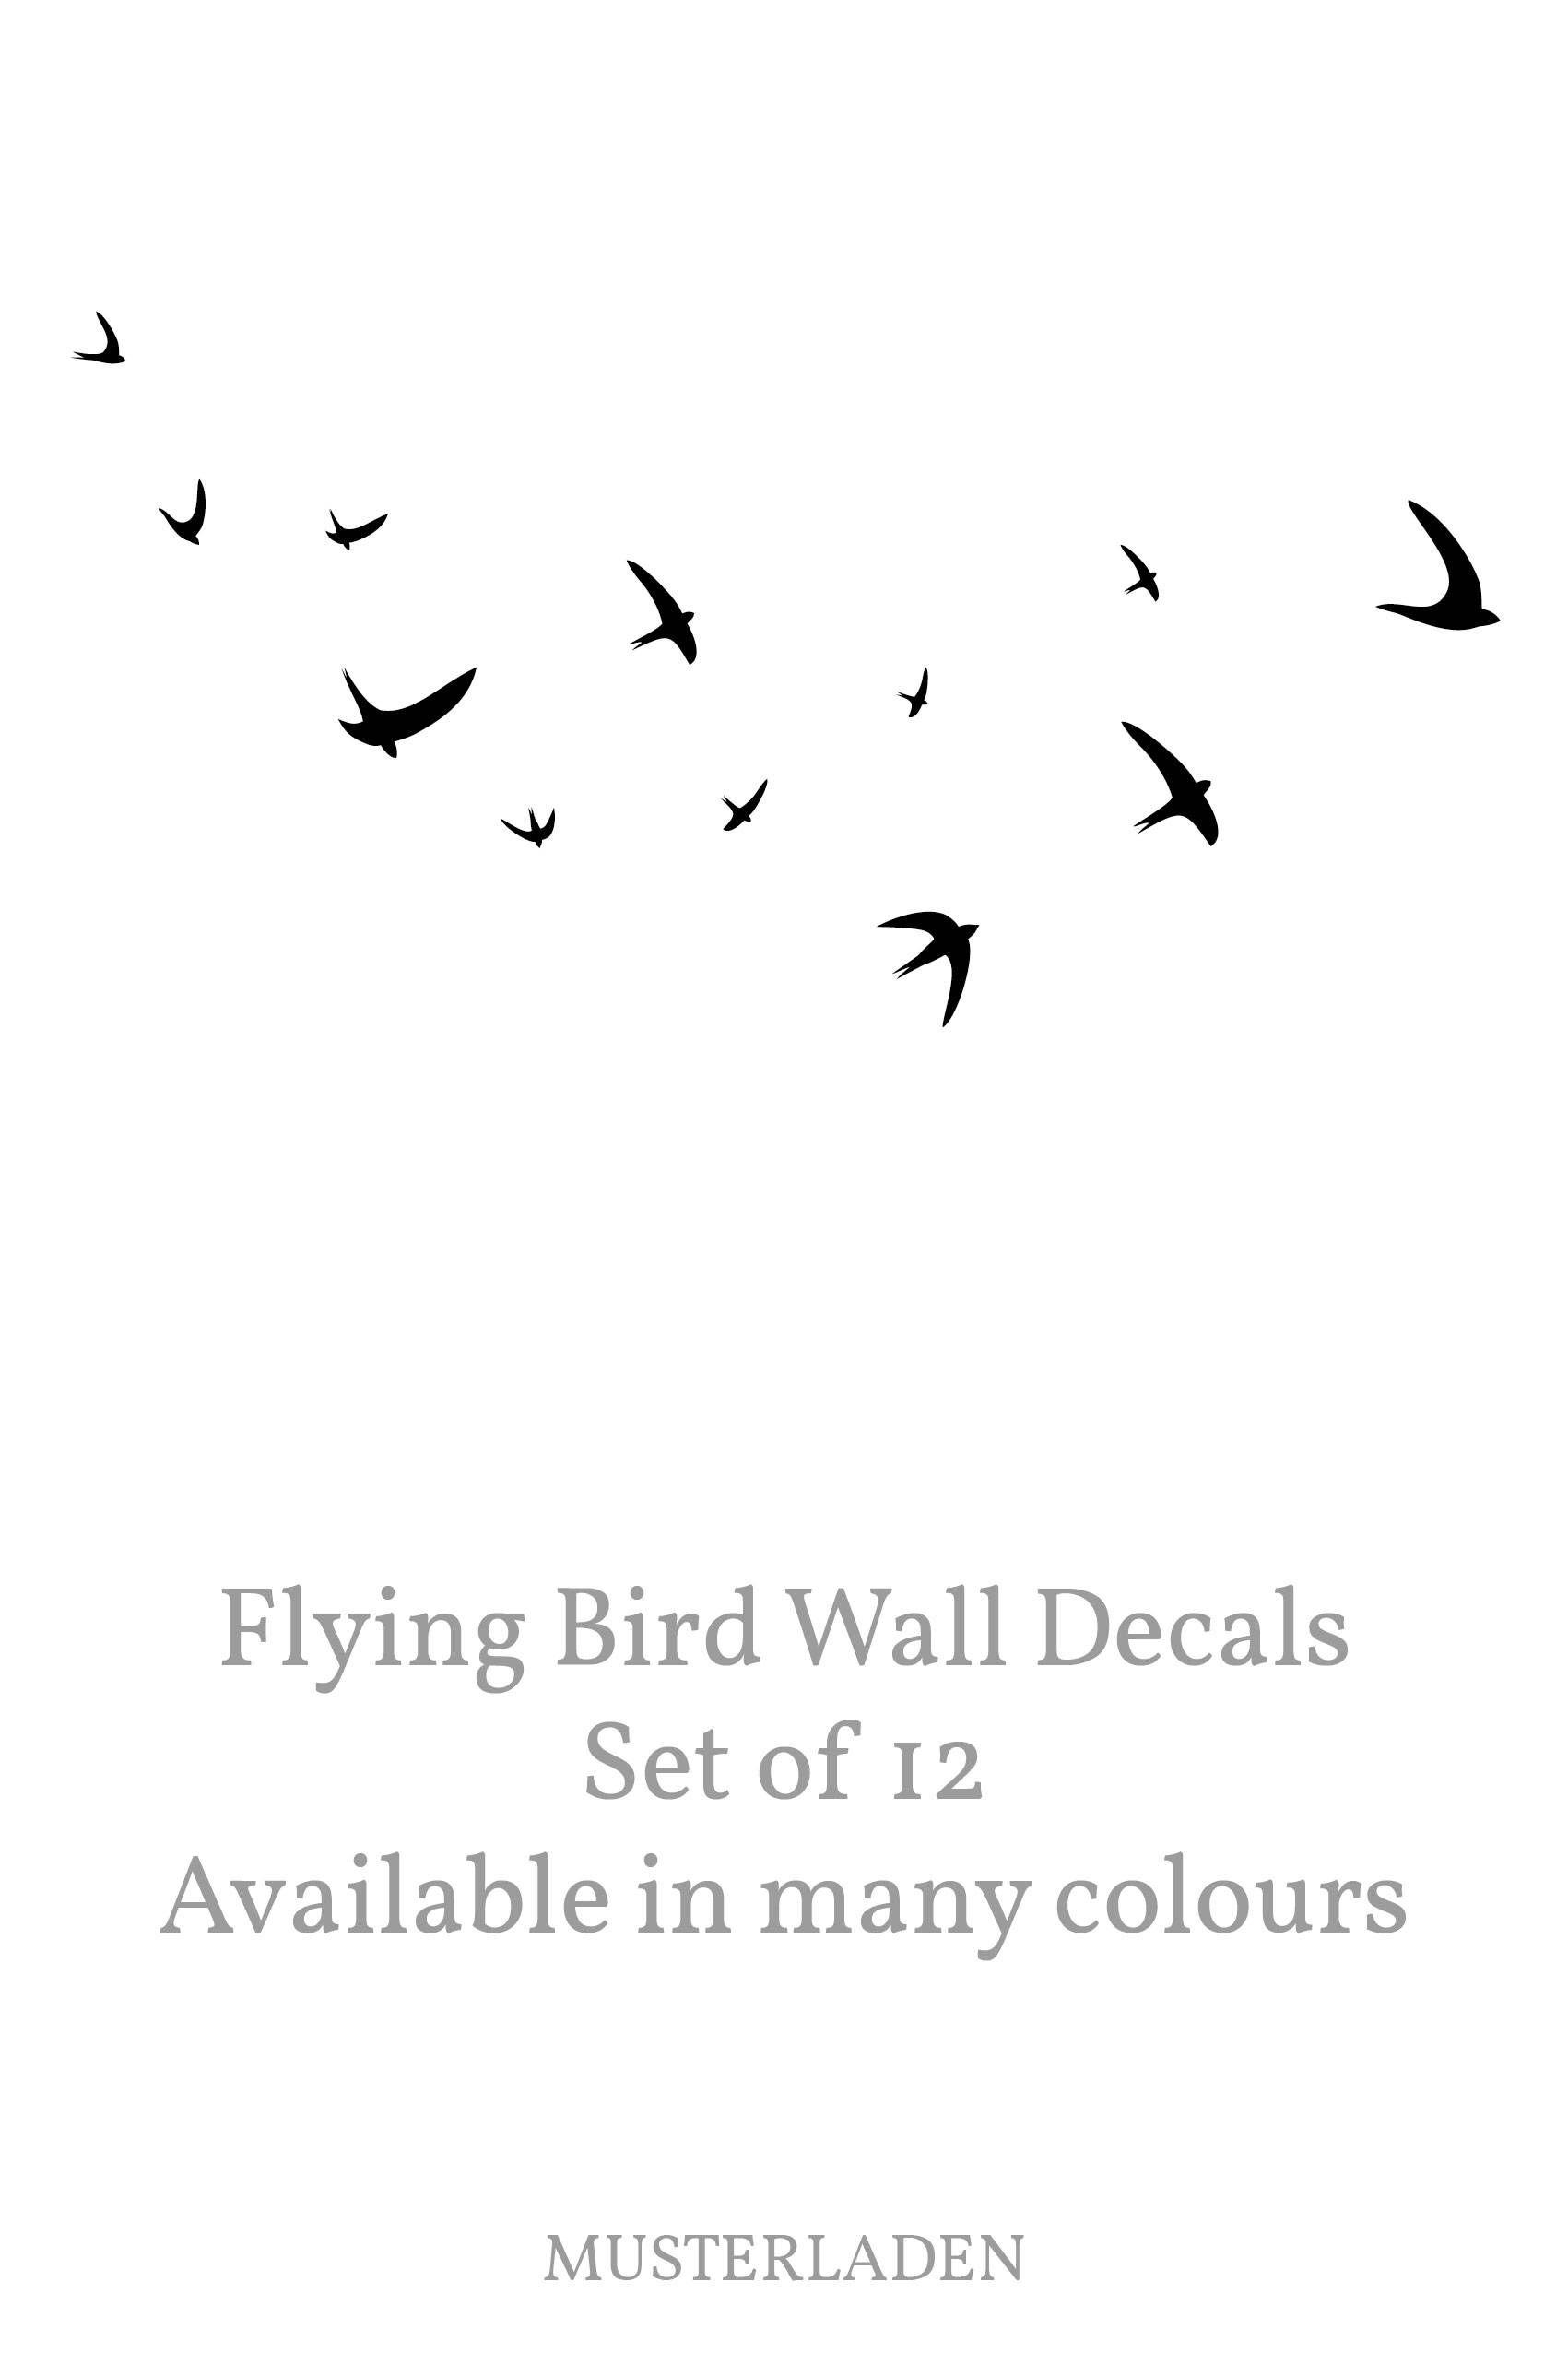 Bird Wall Decal Flying Bird Wall Decal Set of 12 Swallows Minimal Birds Decal Vinyl Bird Stickers Removable Flying Bird Vinyl Decal  sc 1 st  Pinterest & Bird Wall Decal Flying Bird Wall Decal Set of 12 Swallows Minimal ...